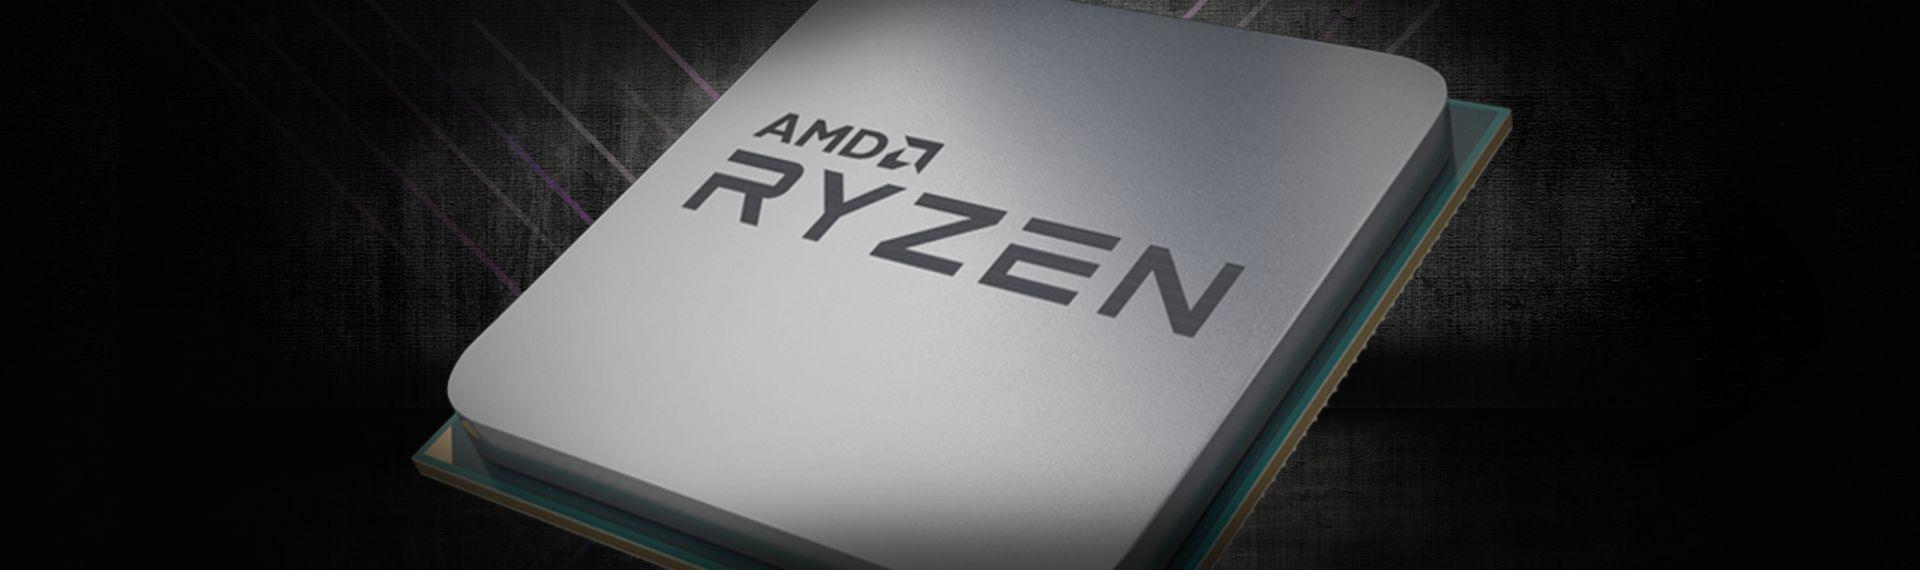 Kenapa Kamu Harus Pakai Laptop Prosesor AMD Sebagai Jeroannya?